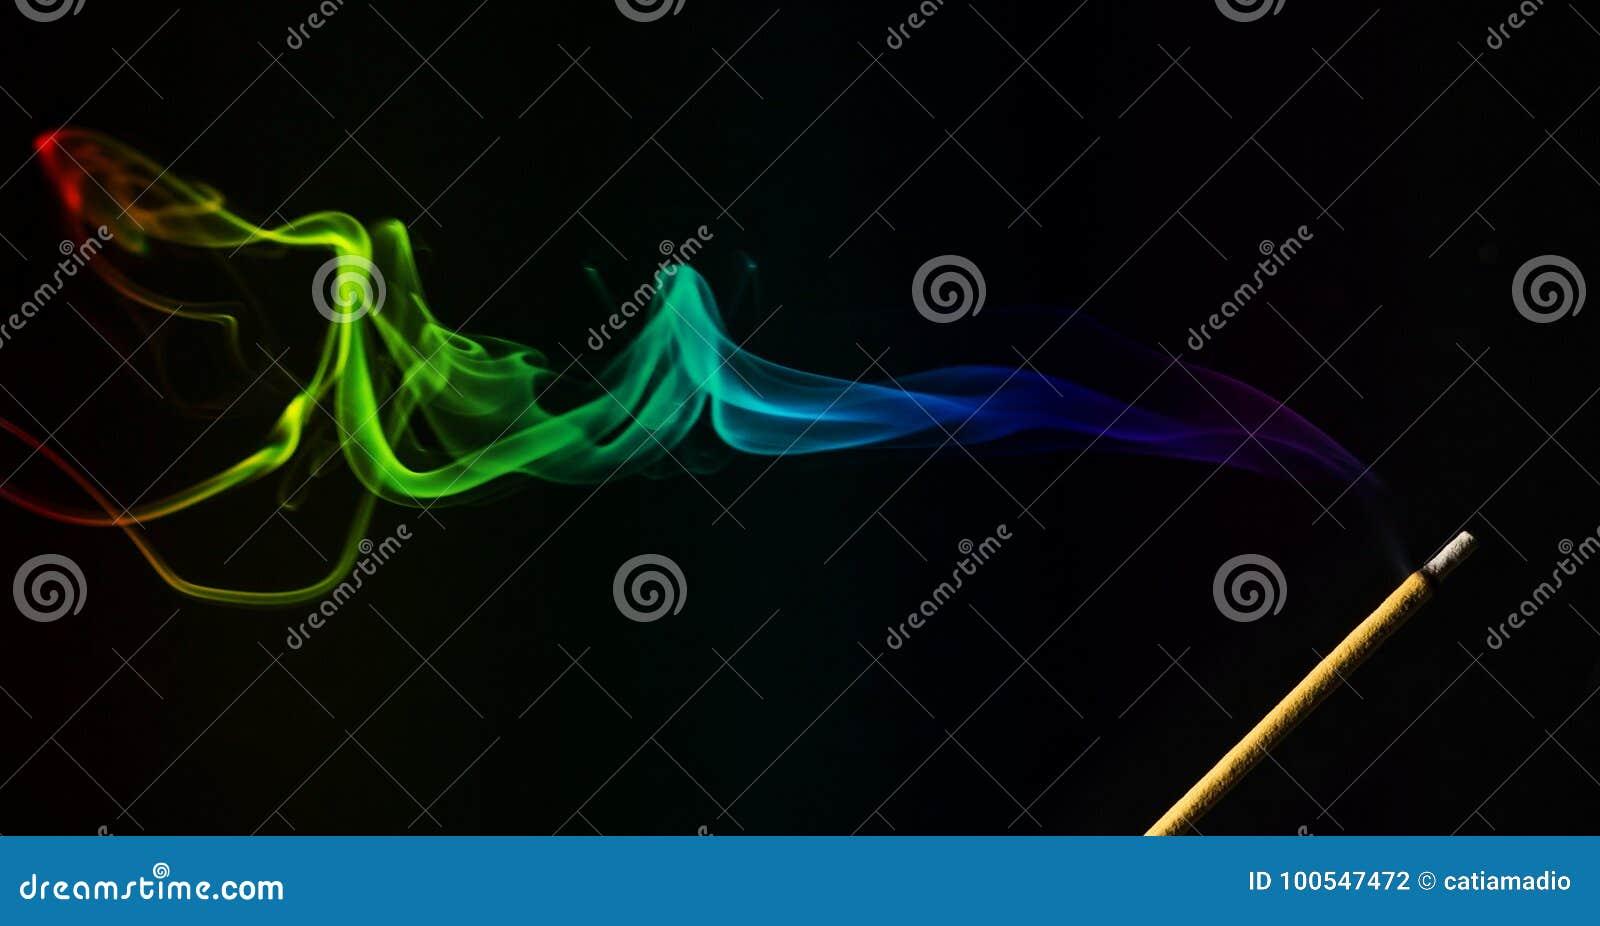 Incense smoke with stick